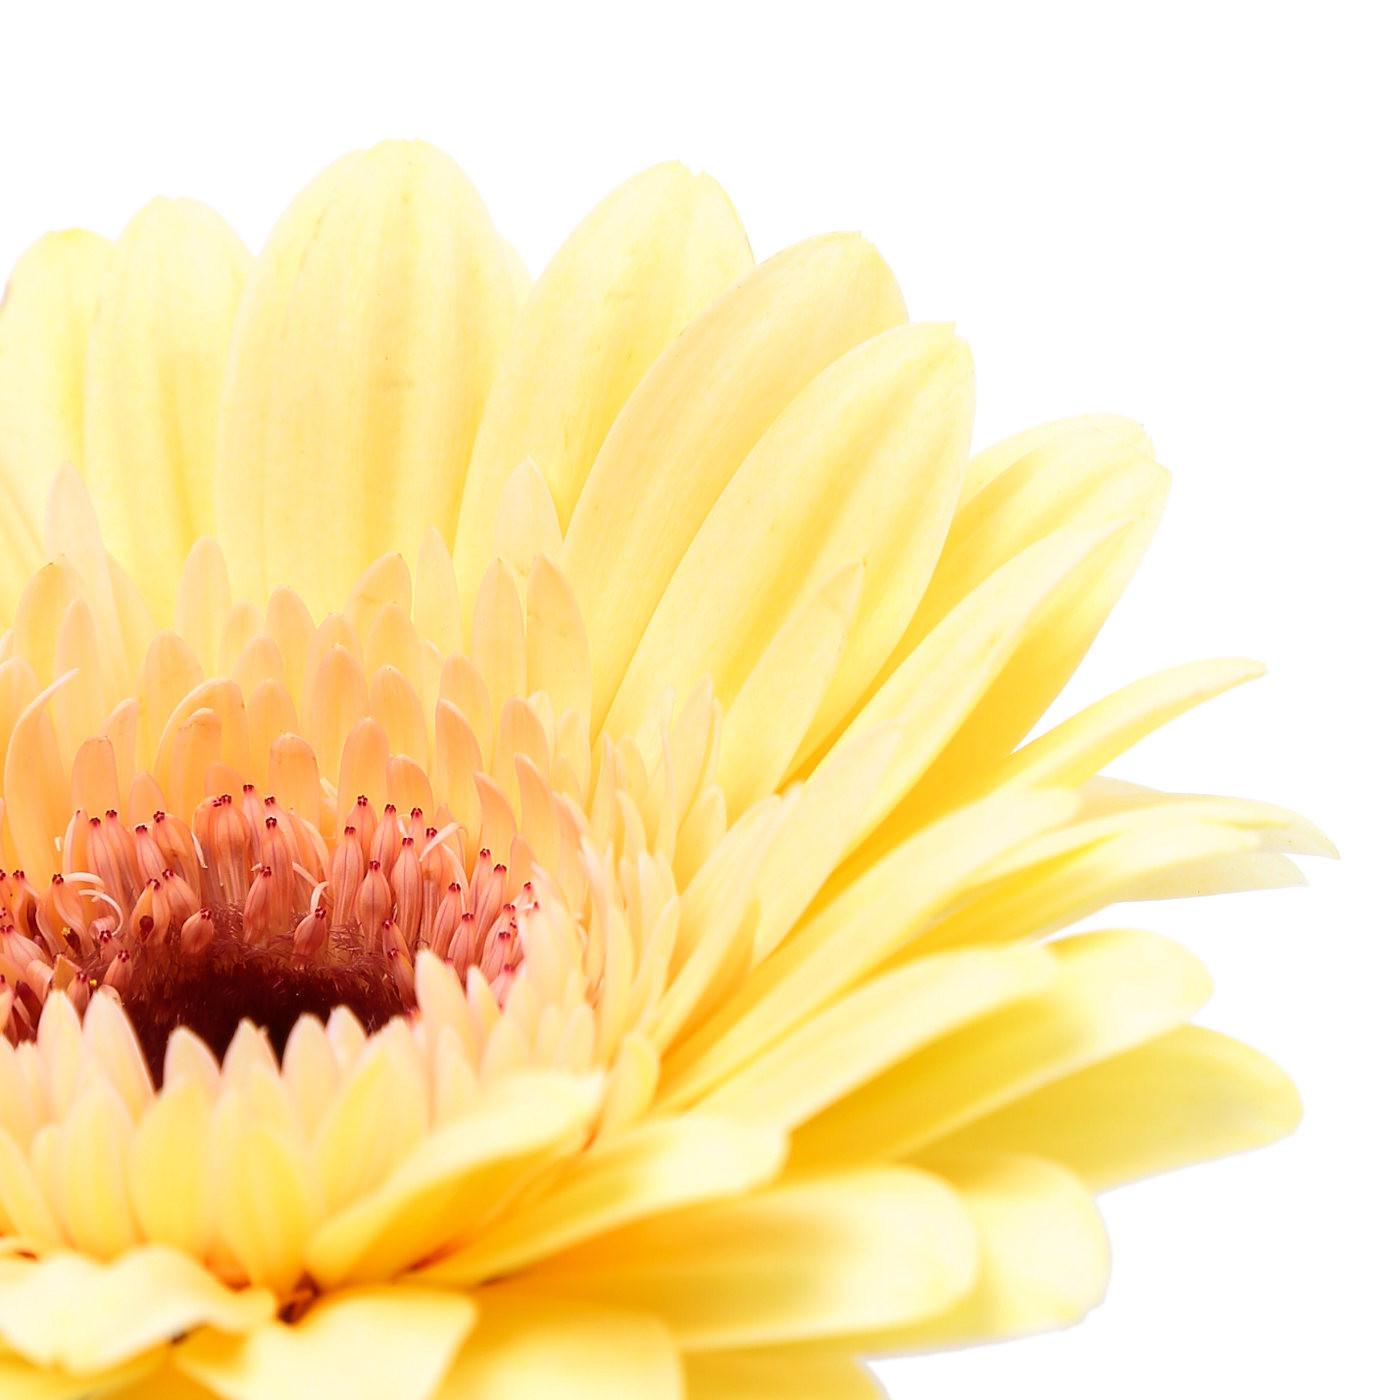 Une petite fleur - Olivier Gechter